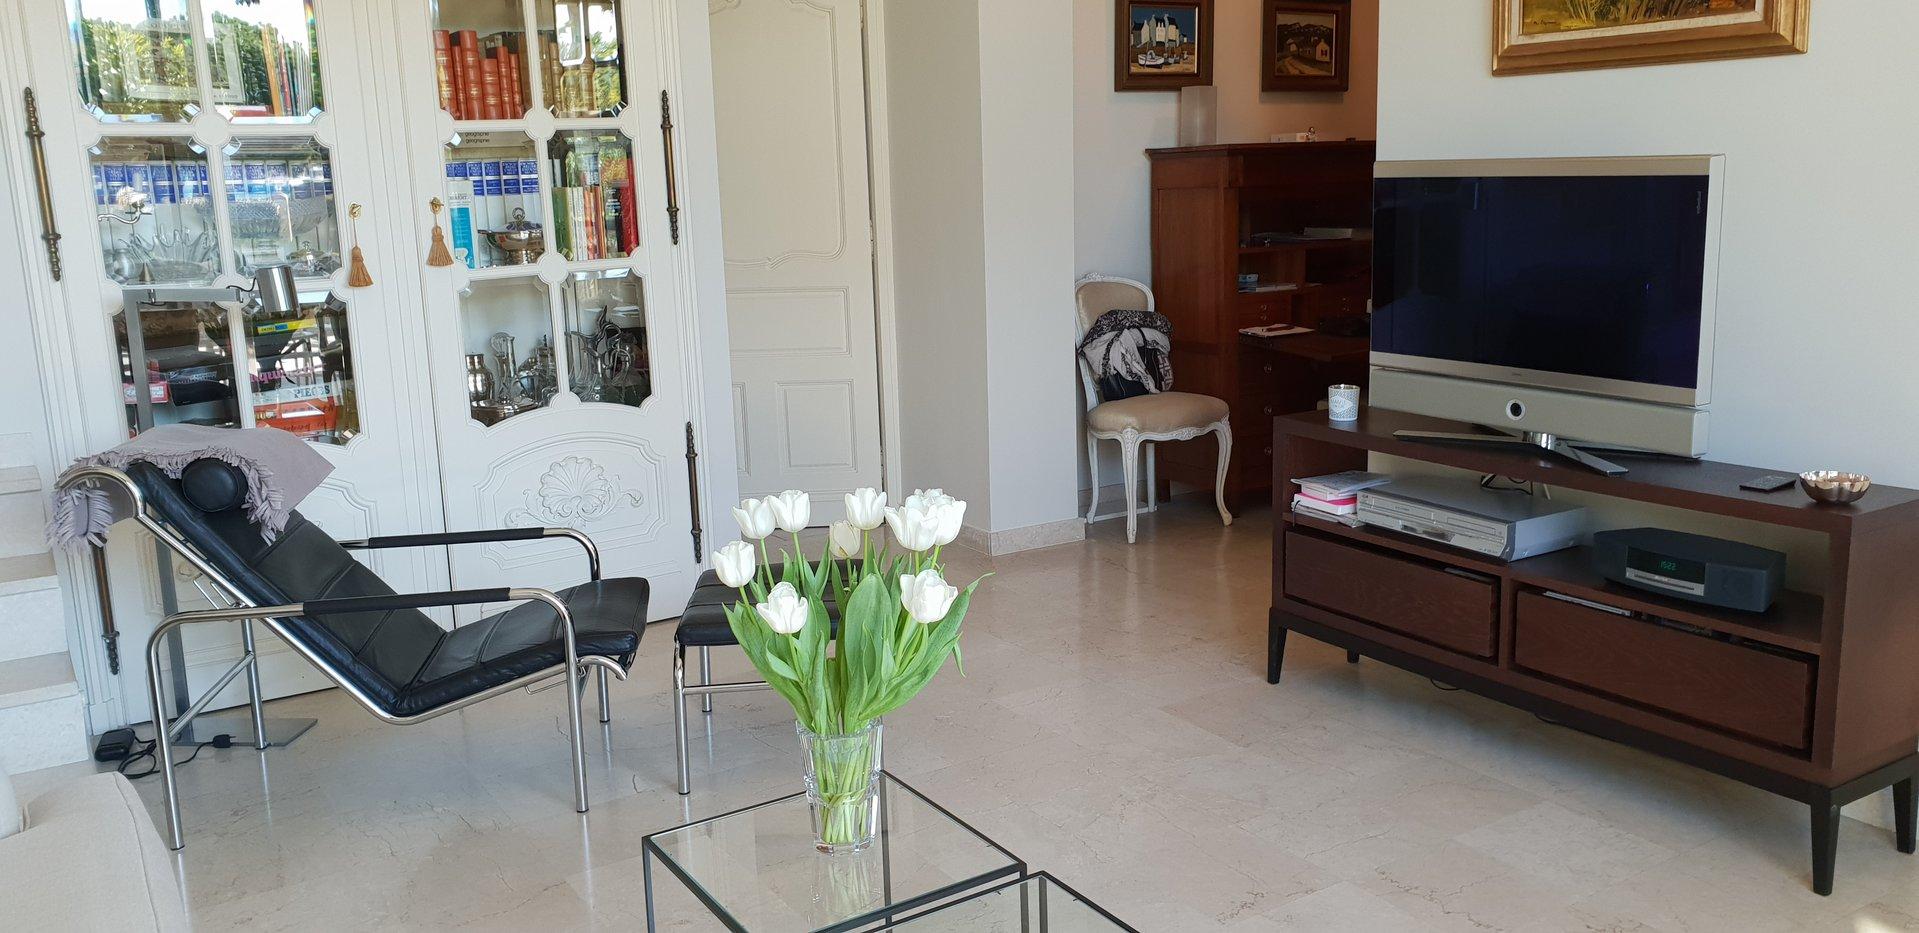 Congress rental 2 bedroom on Croisette palm beac h area